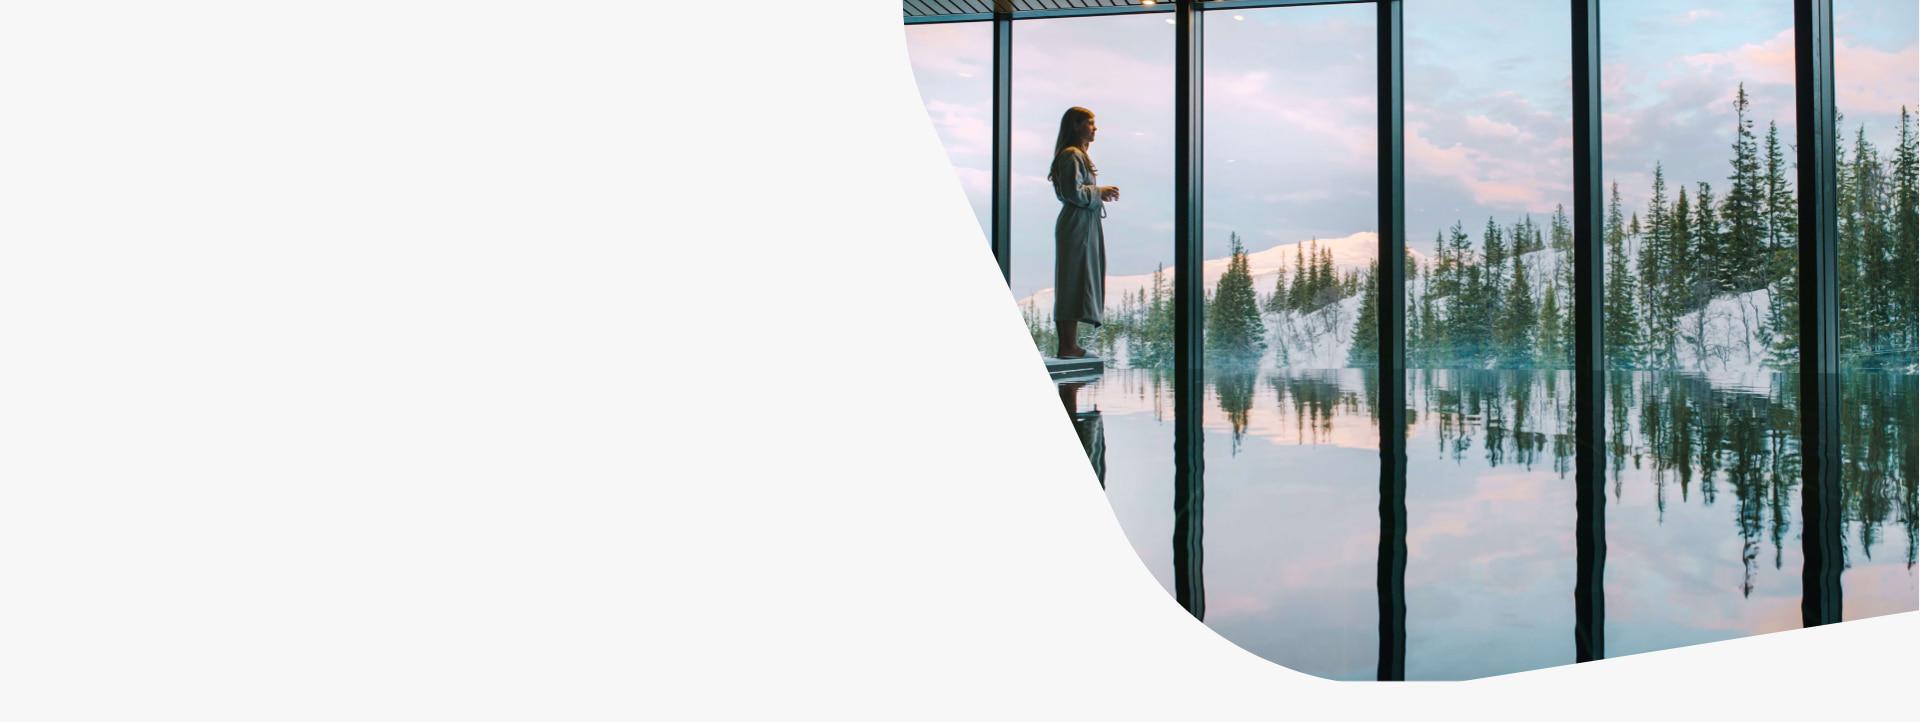 Customer_Case_Nordic_Hotels_Resorts_Folden